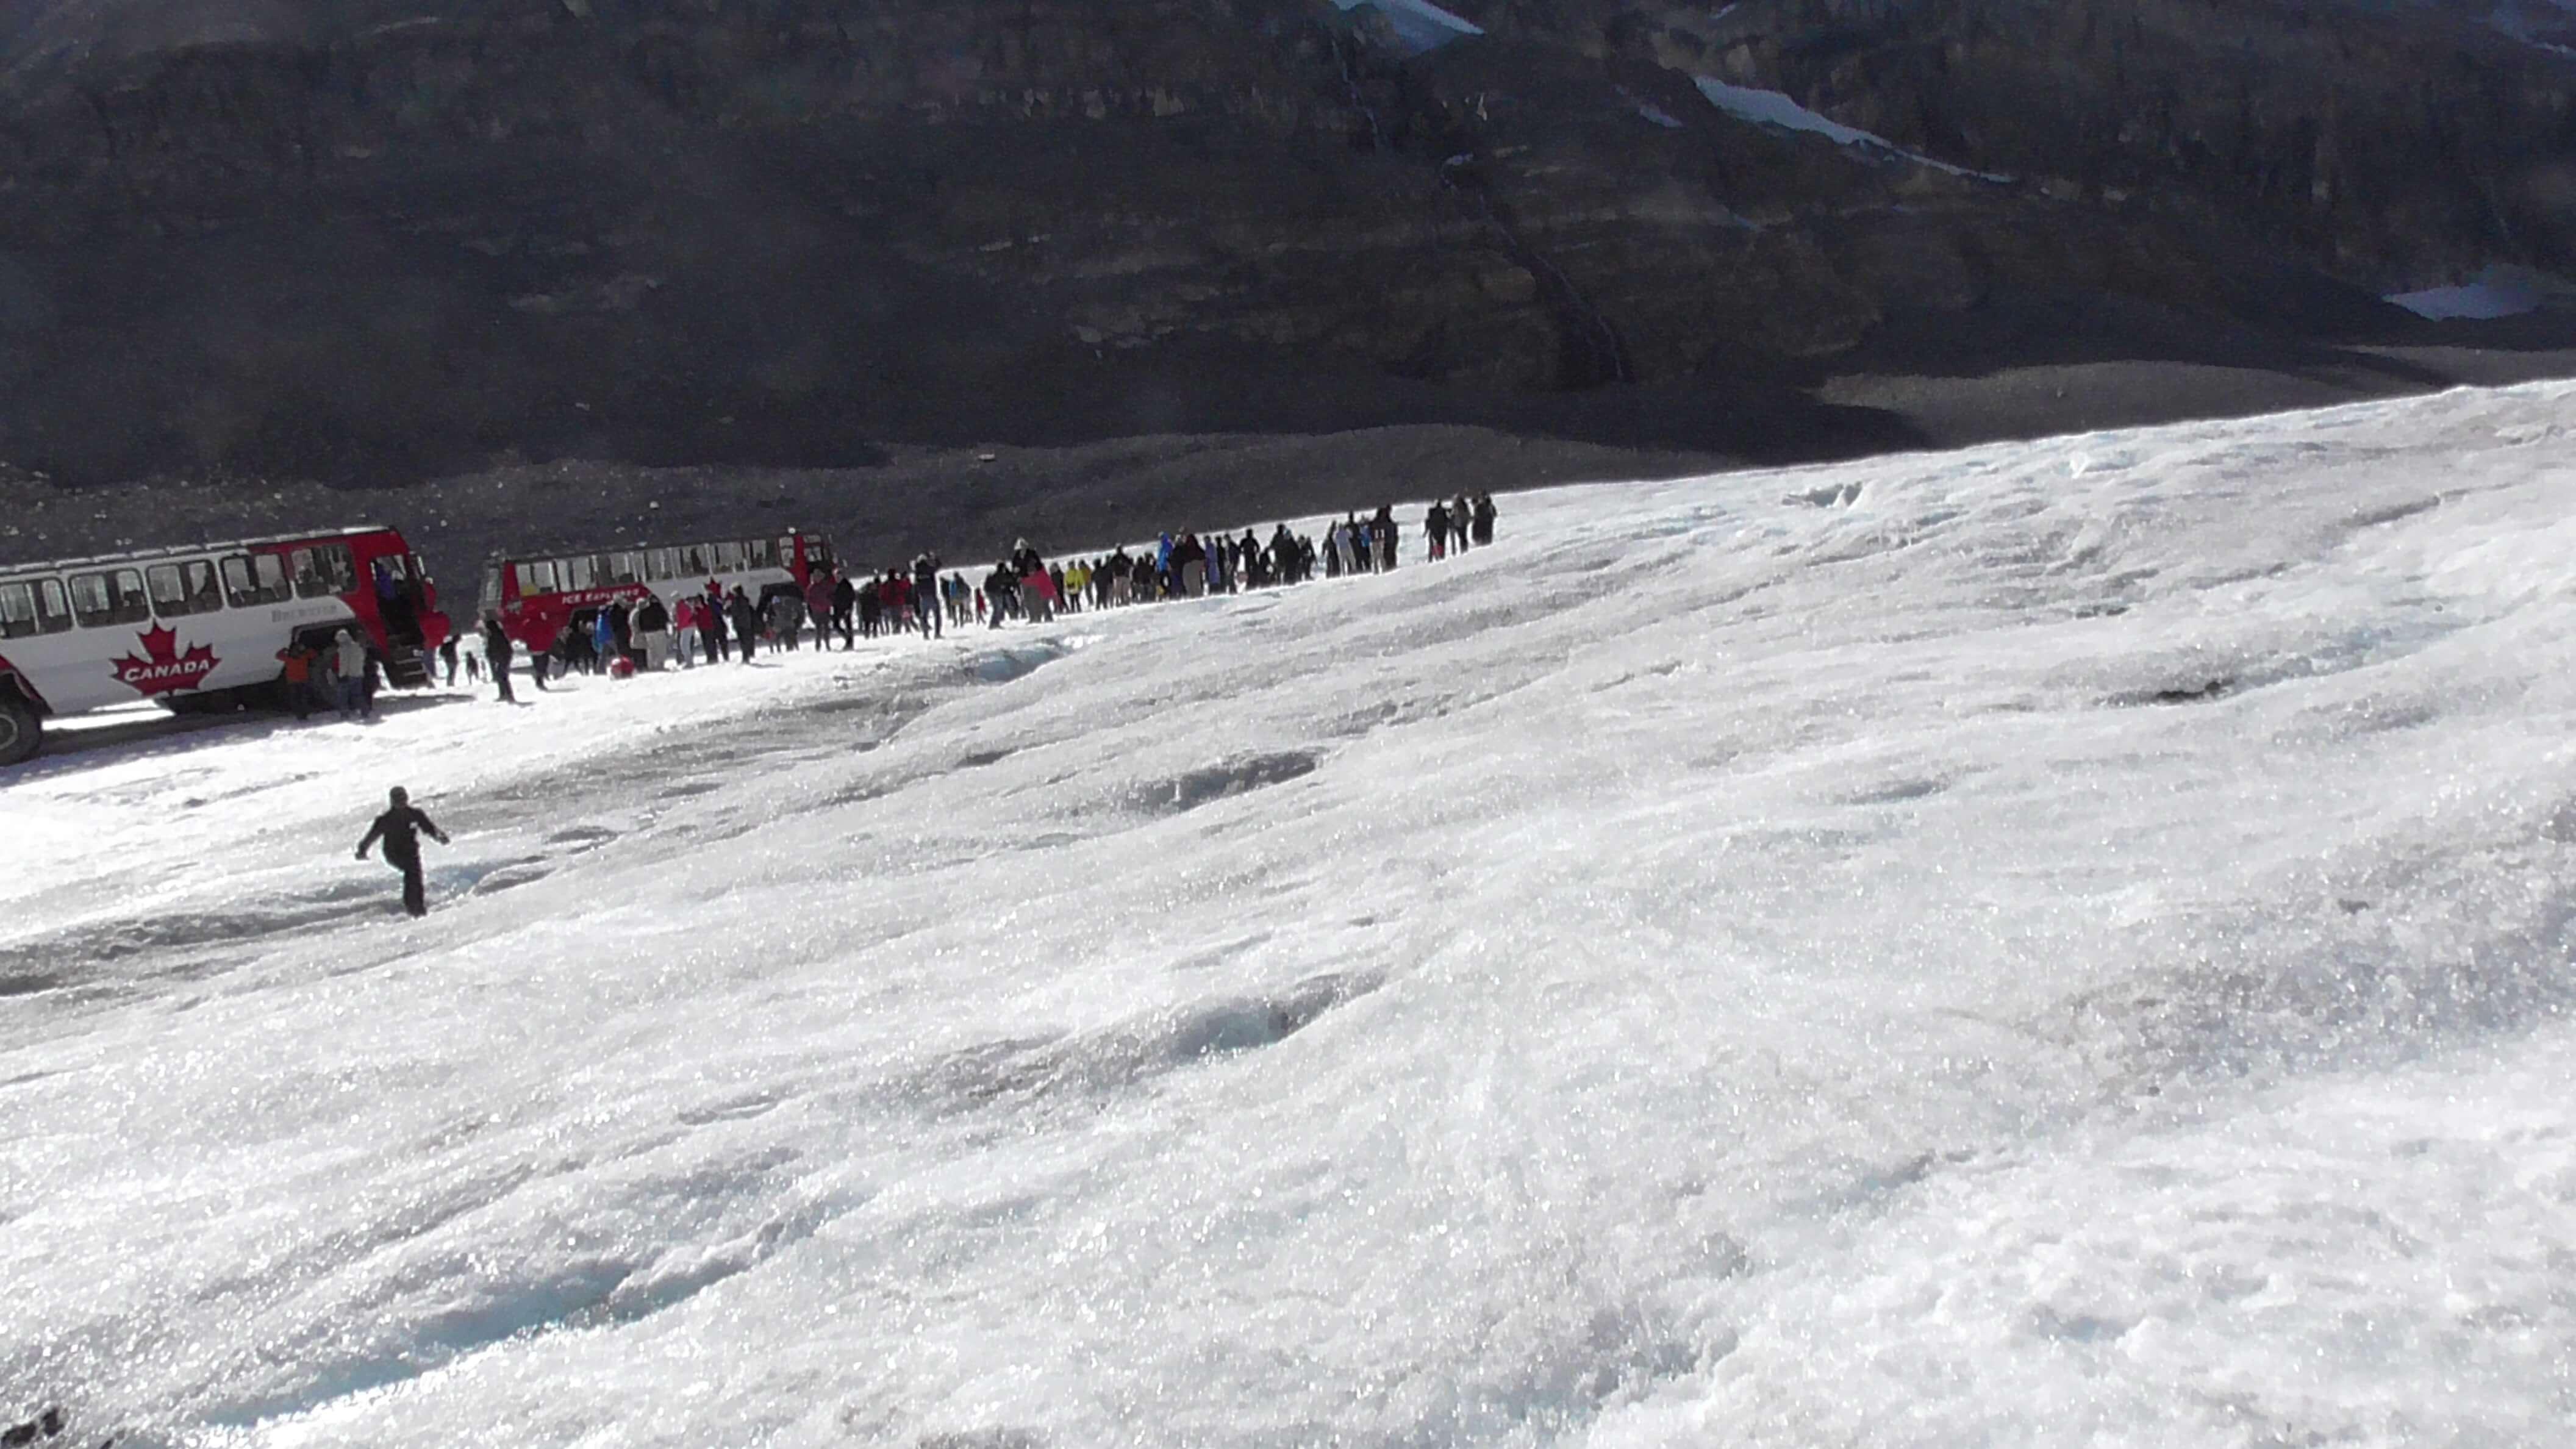 Slightly irate guide on Athabasca Glacier, Jasper National Park, Alberta